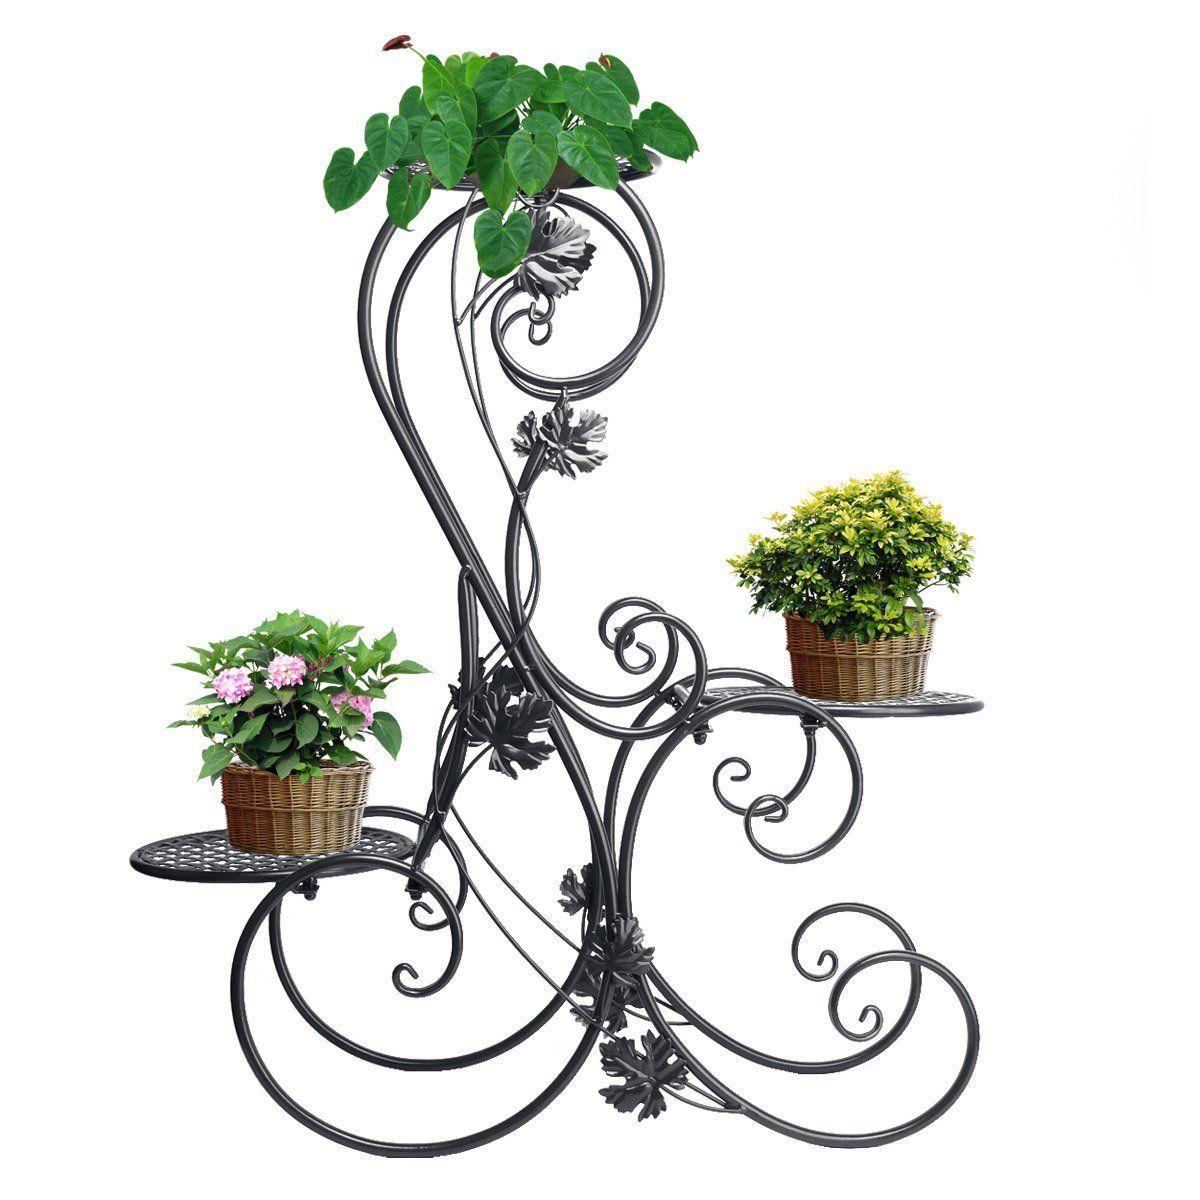 7d2382acf2cd 3 Tiered Scroll Decorative Black Metal Garden Patio Stands Plant Flower Pot  Rack Display Shelf Holds 3 Flower Pot